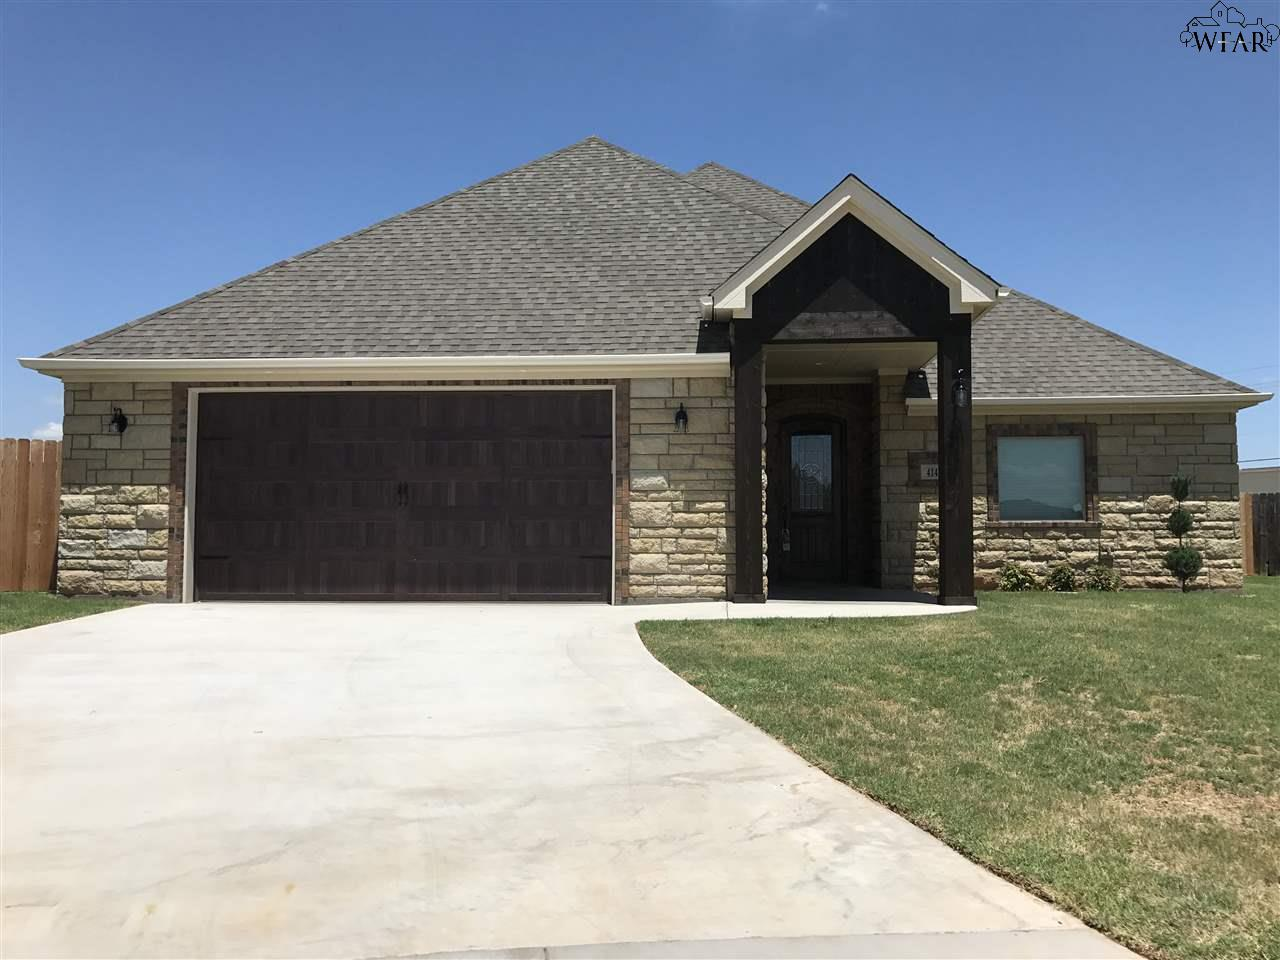 4146 CANDLEWOOD CIRCLE, Wichita Falls, TX 76308